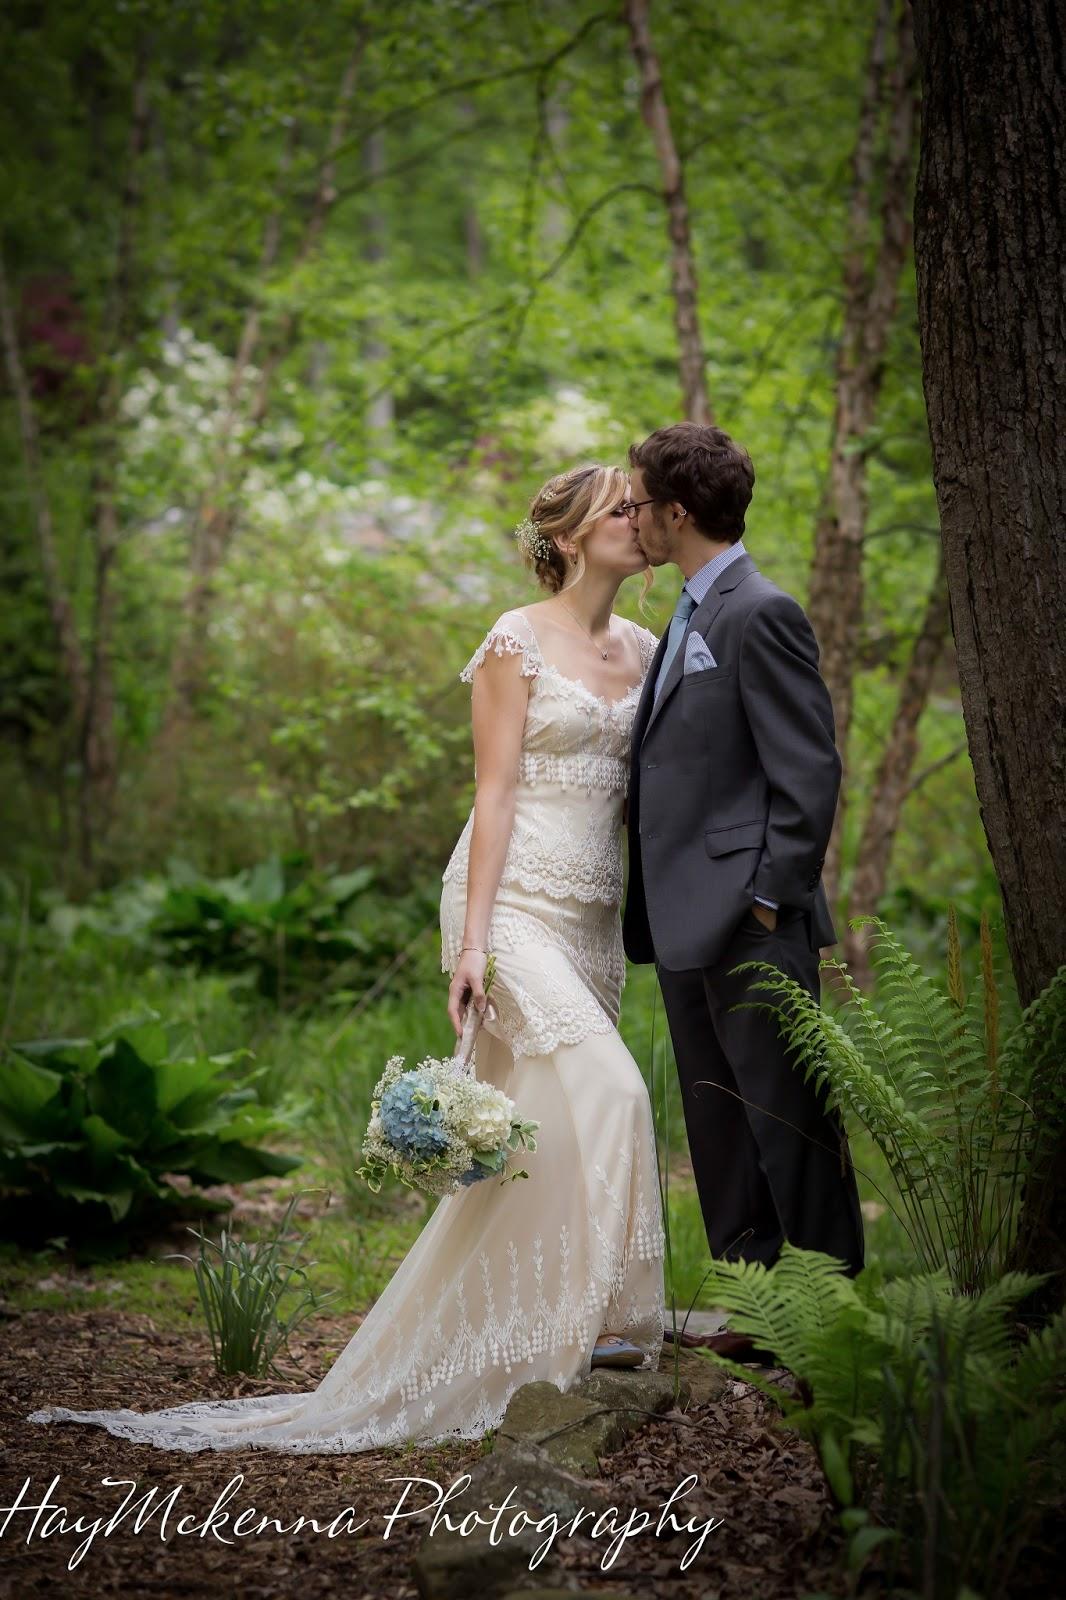 Haymckenna Photography Outdoor Wedding In The Woods At